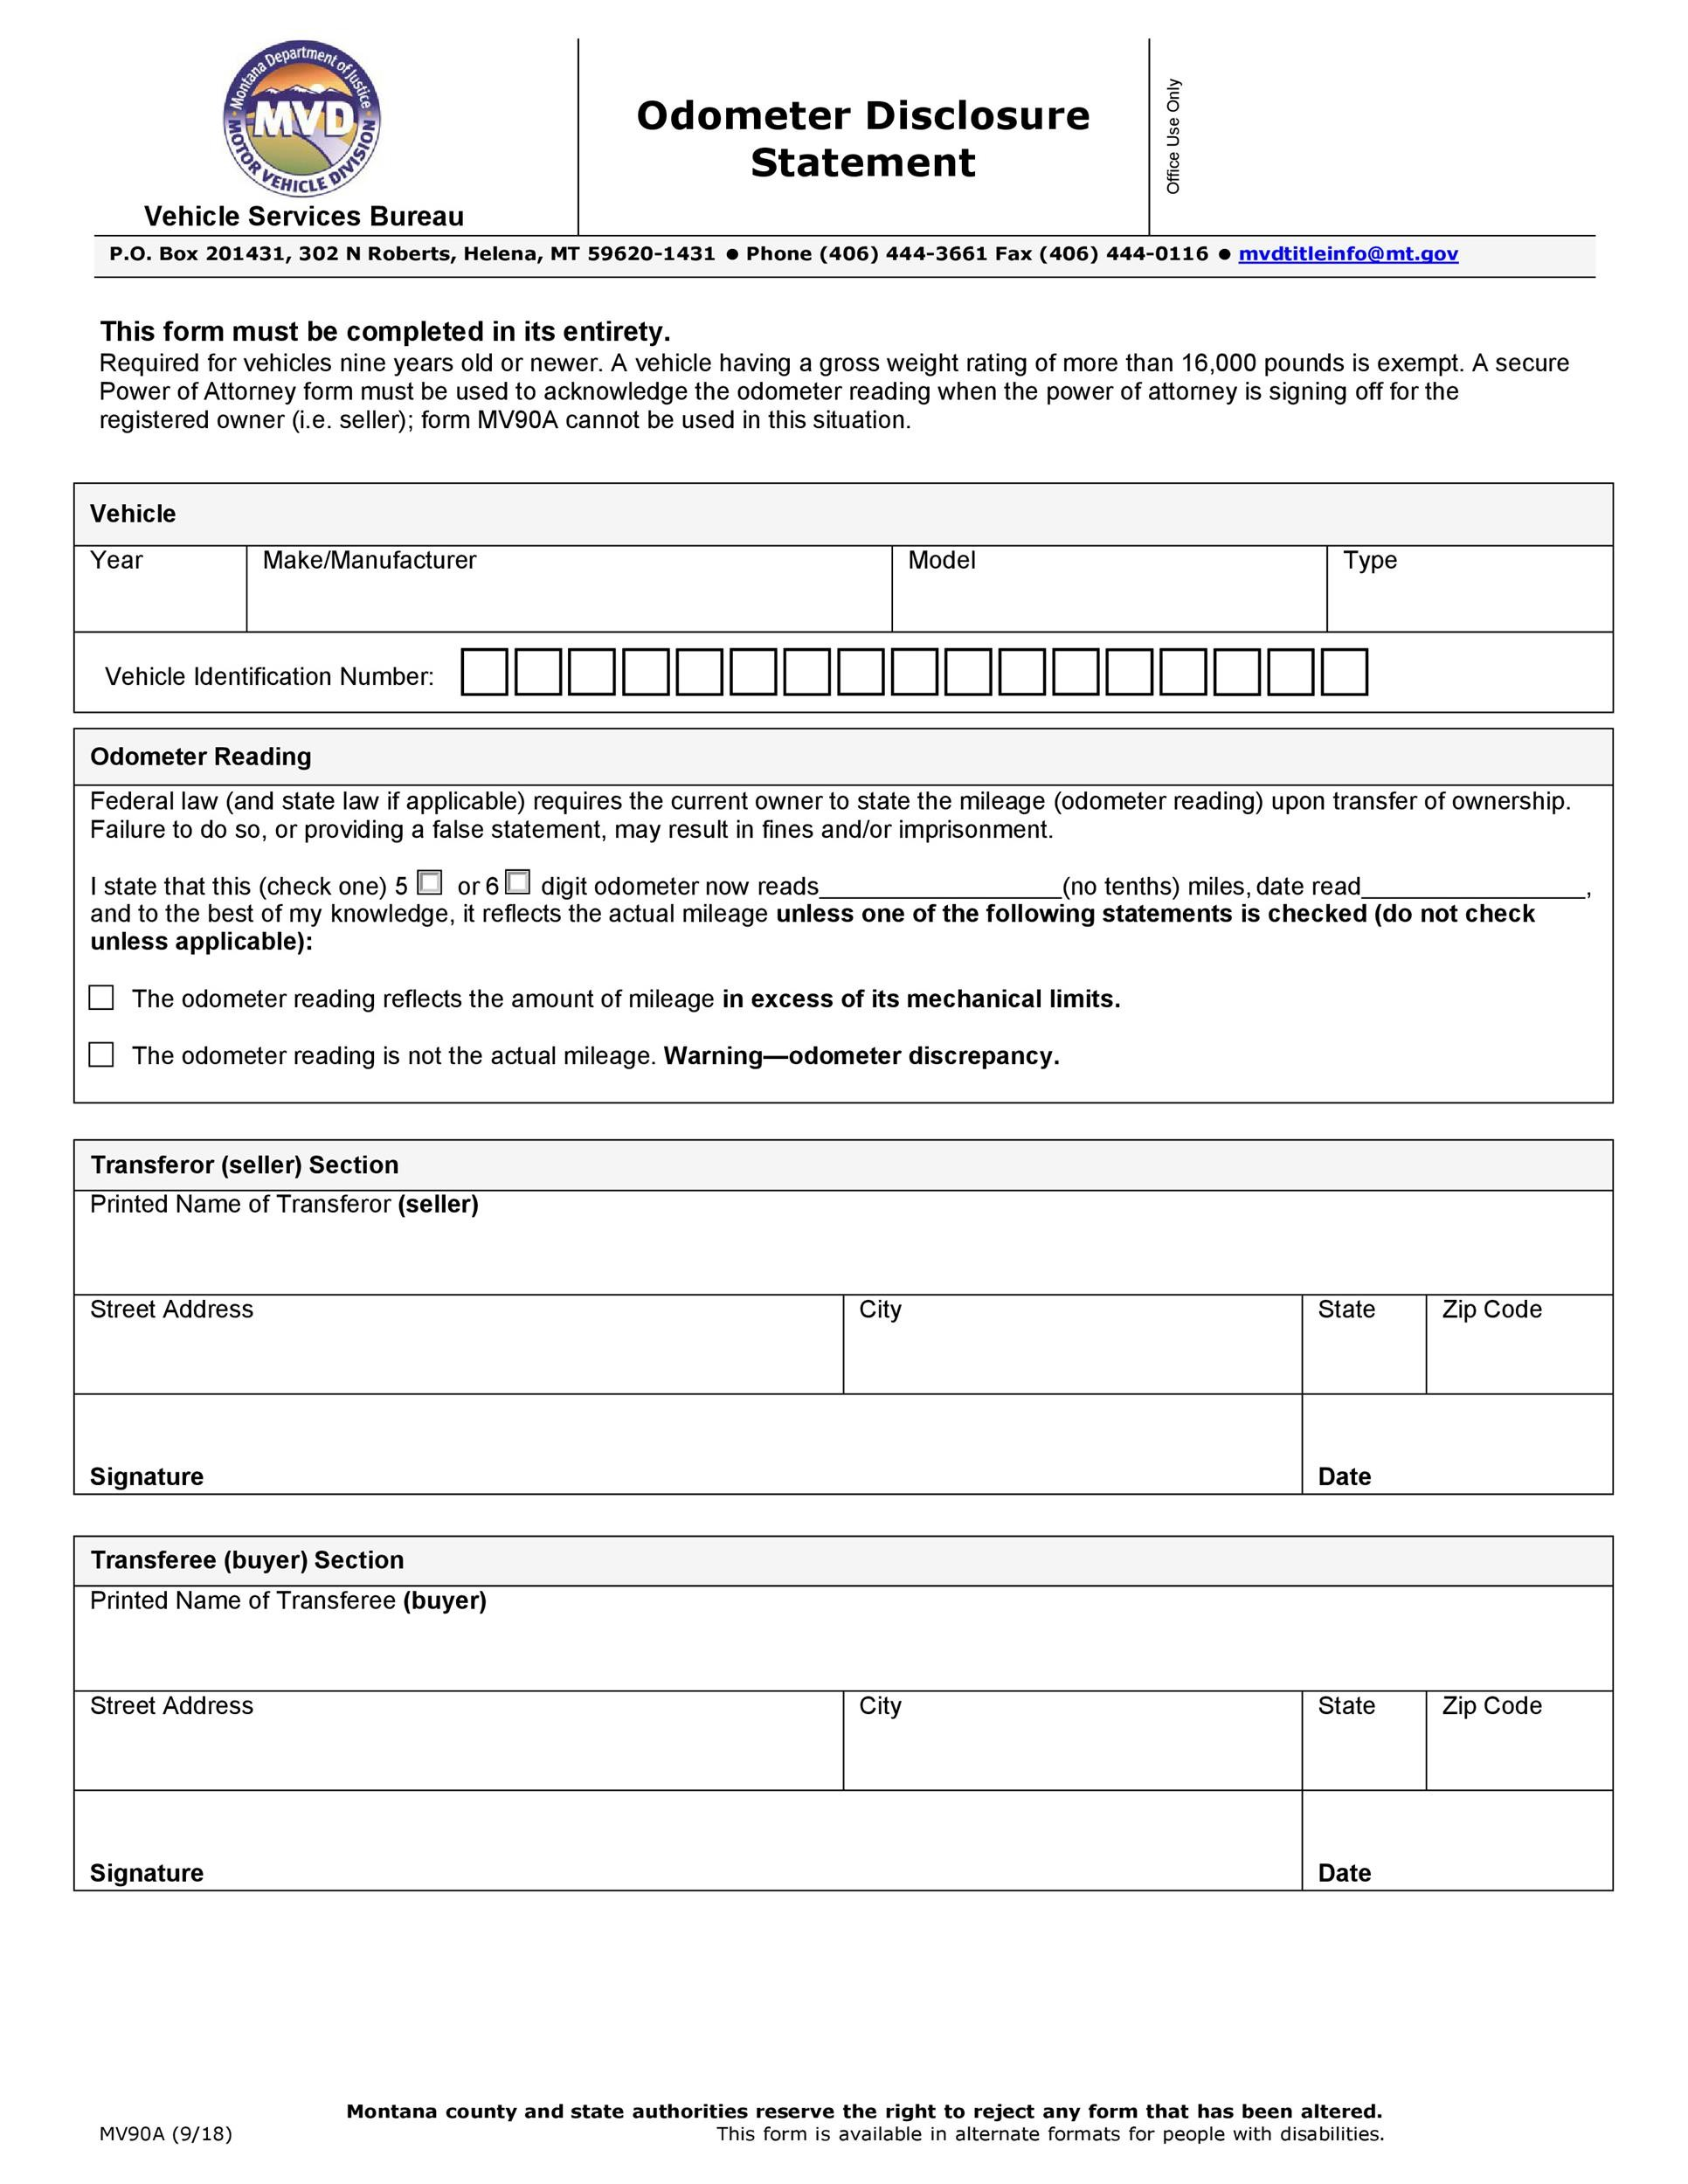 Free odometer disclosure statement 37